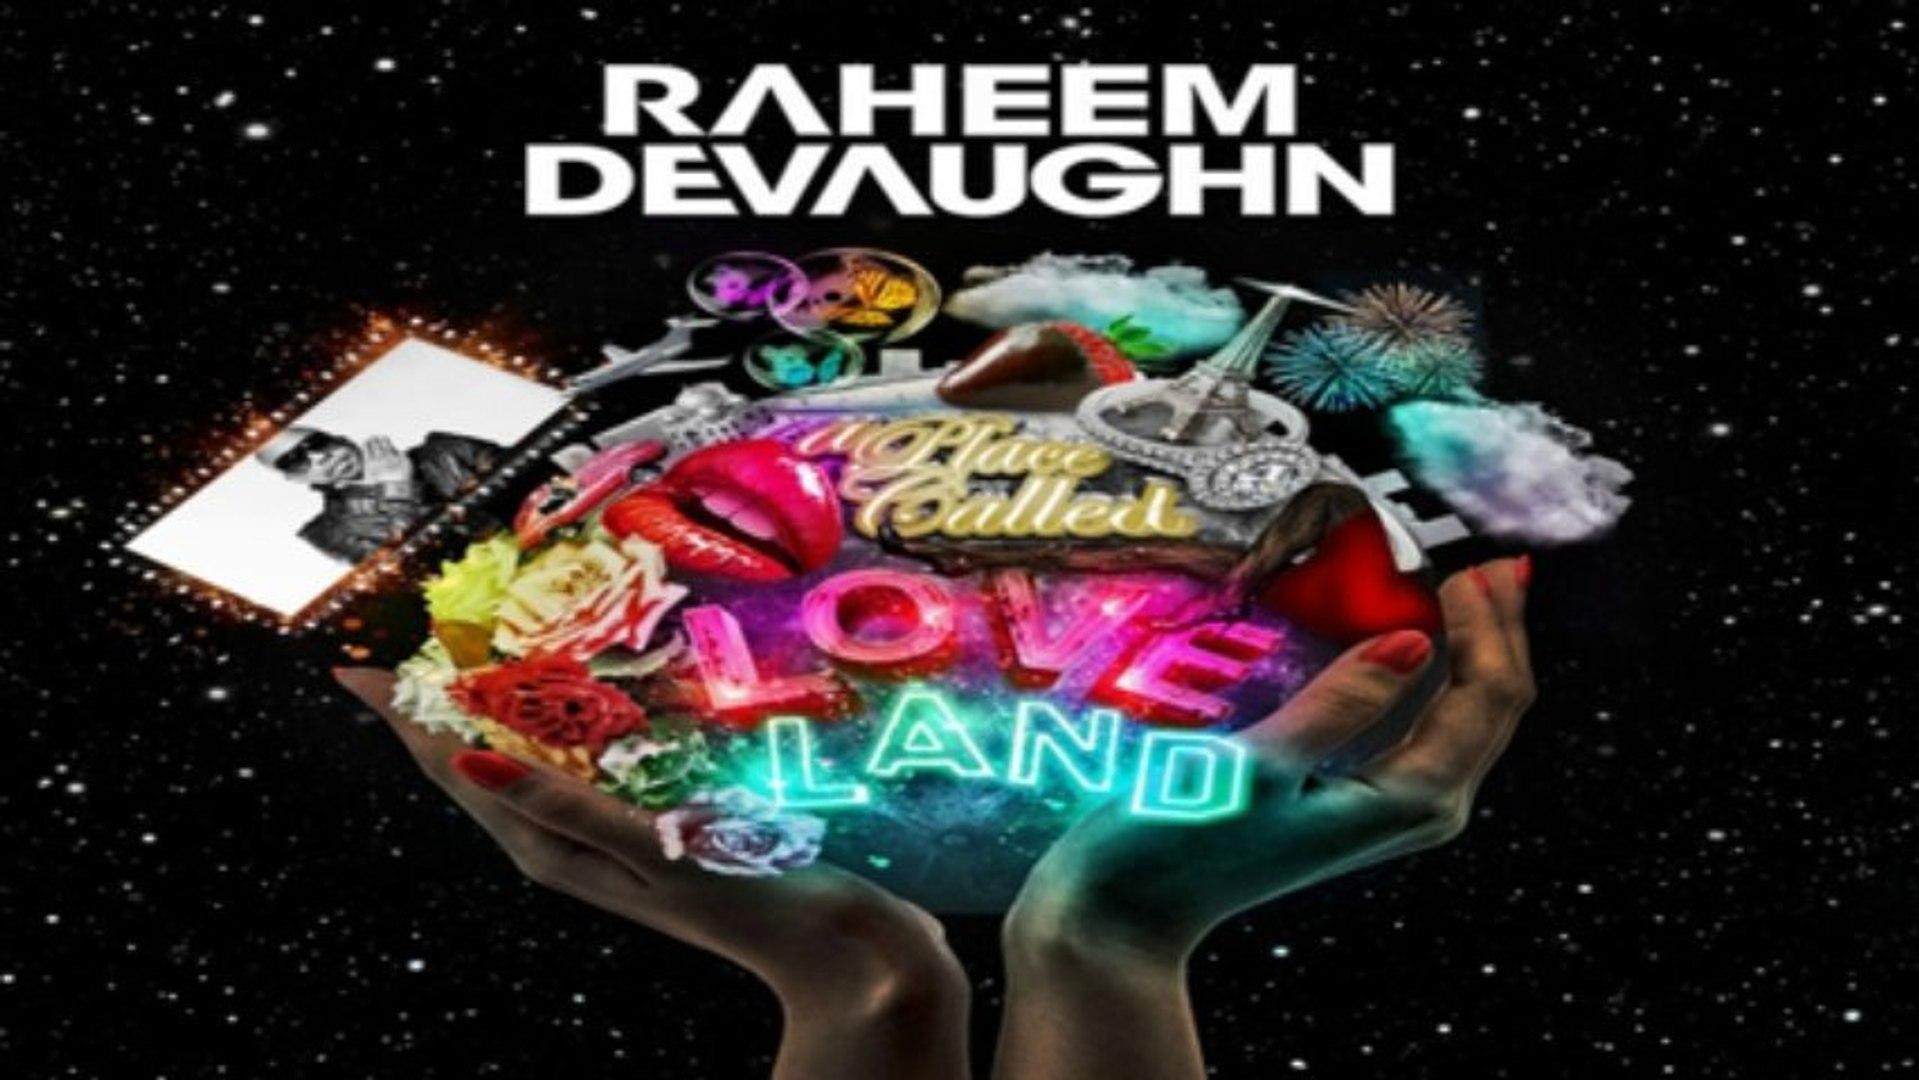 raheem devaughn a place called loveland free mp3